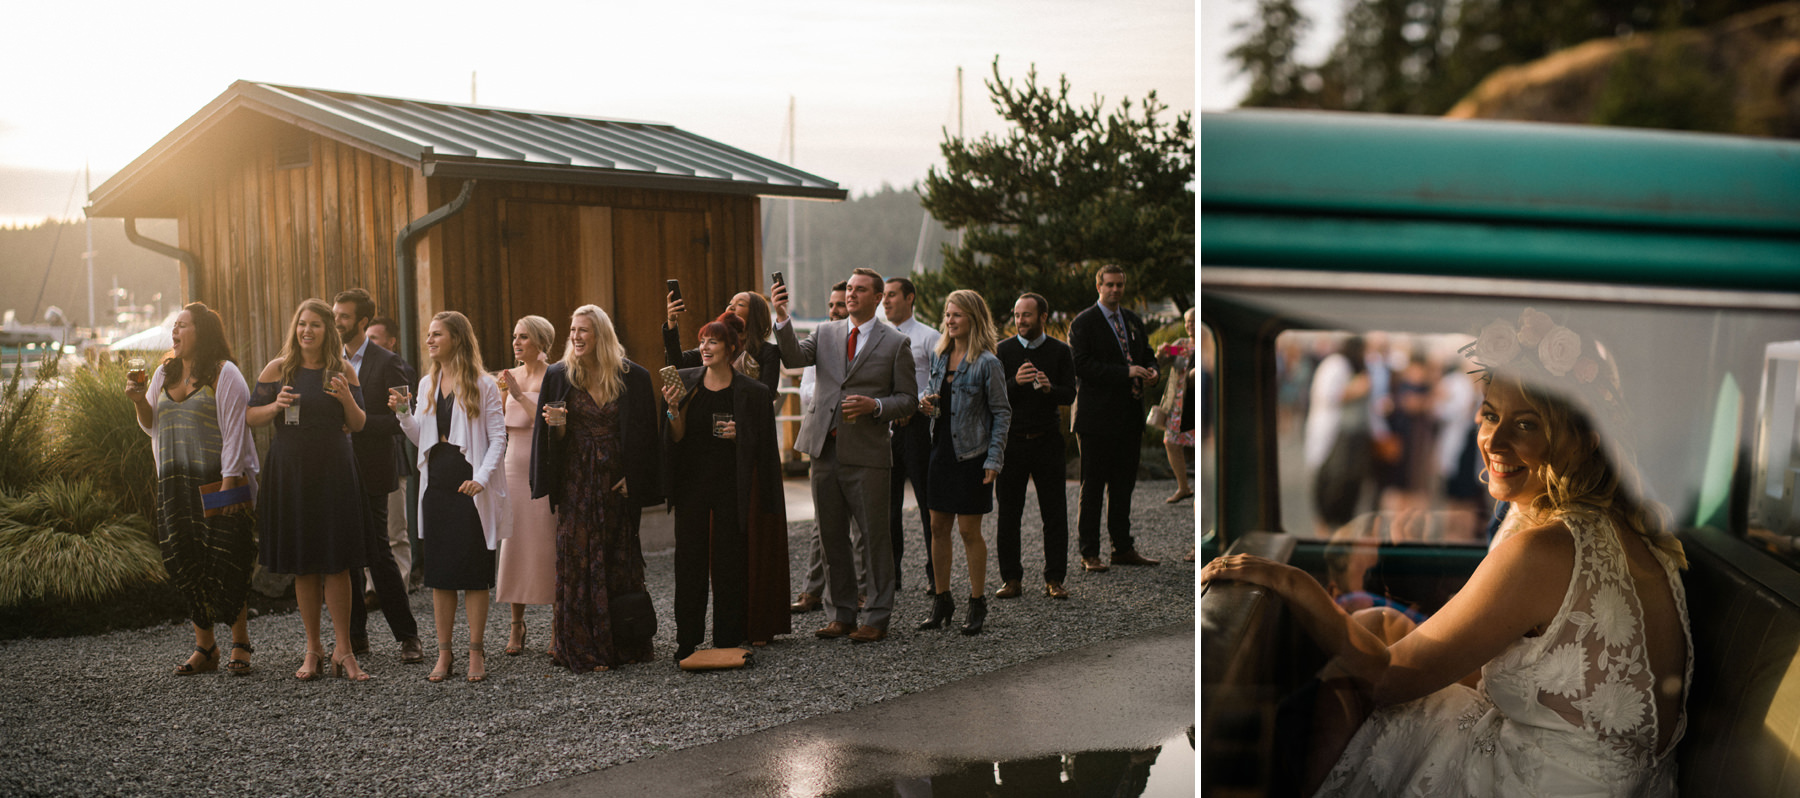 358-colorful-outdoor-lopez-island-wedding.jpg